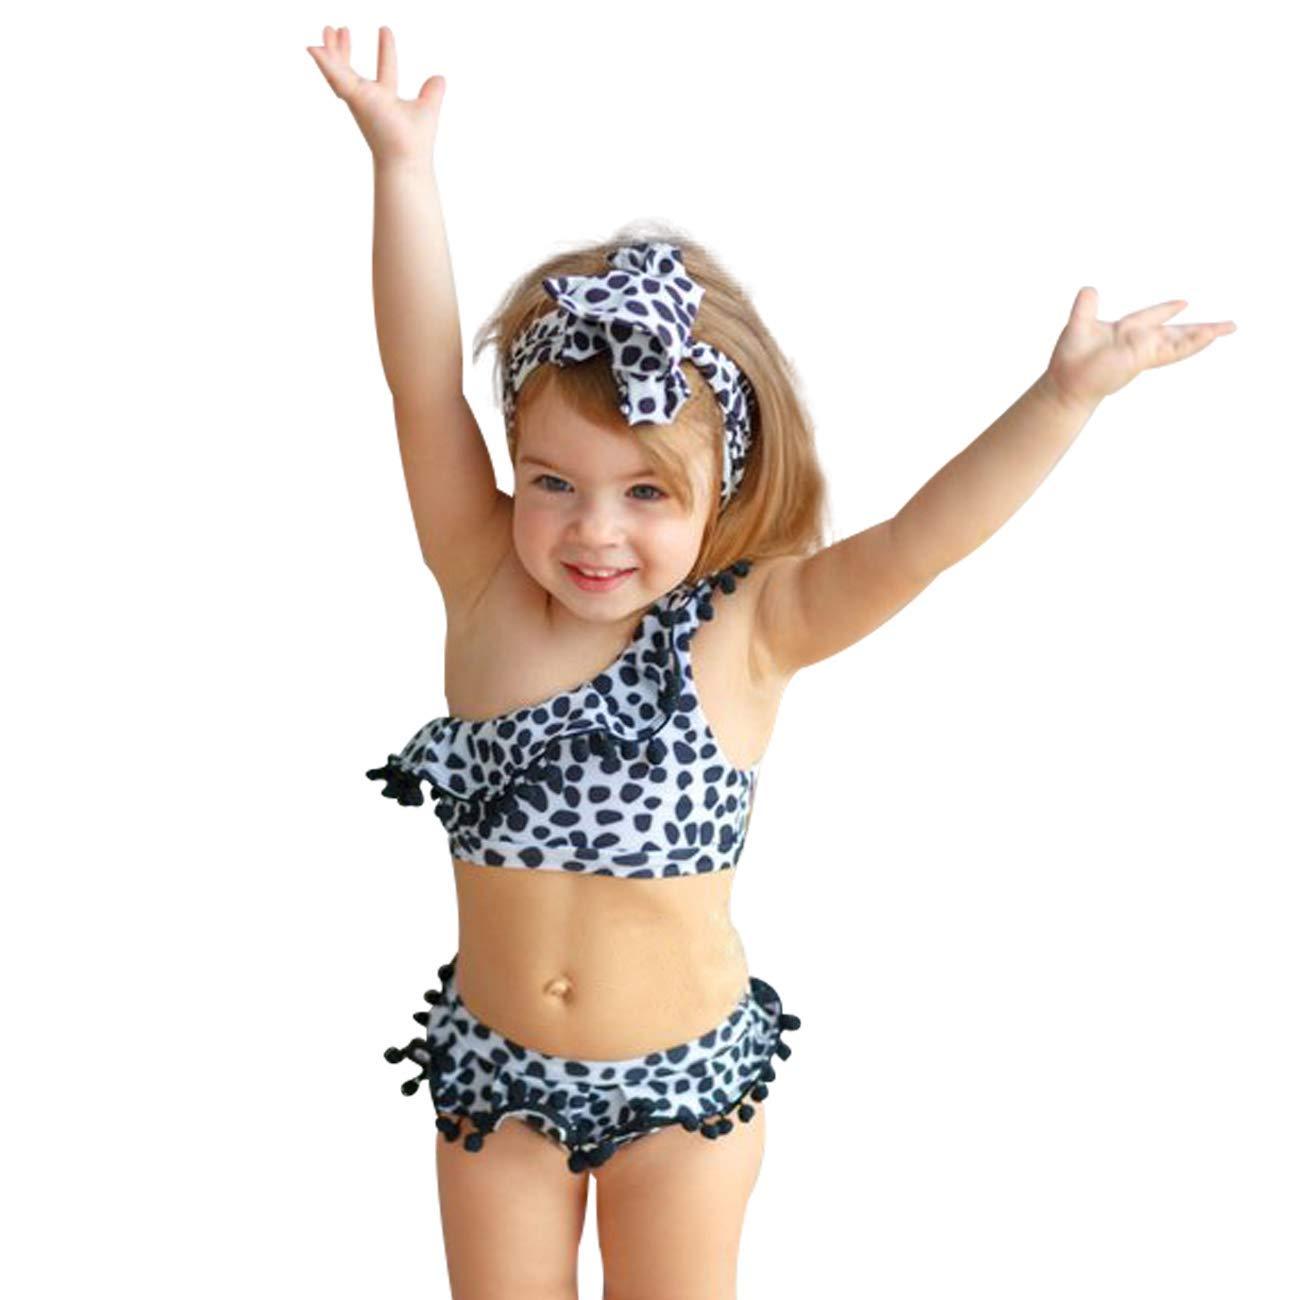 b02f19b500 Amazon.com: Yoveme Toddler Baby Girls Bikini Swimsuit Cute Polka Dot Bikini  Set Swimwear Beachwear with Headband Black 2-6T: Clothing